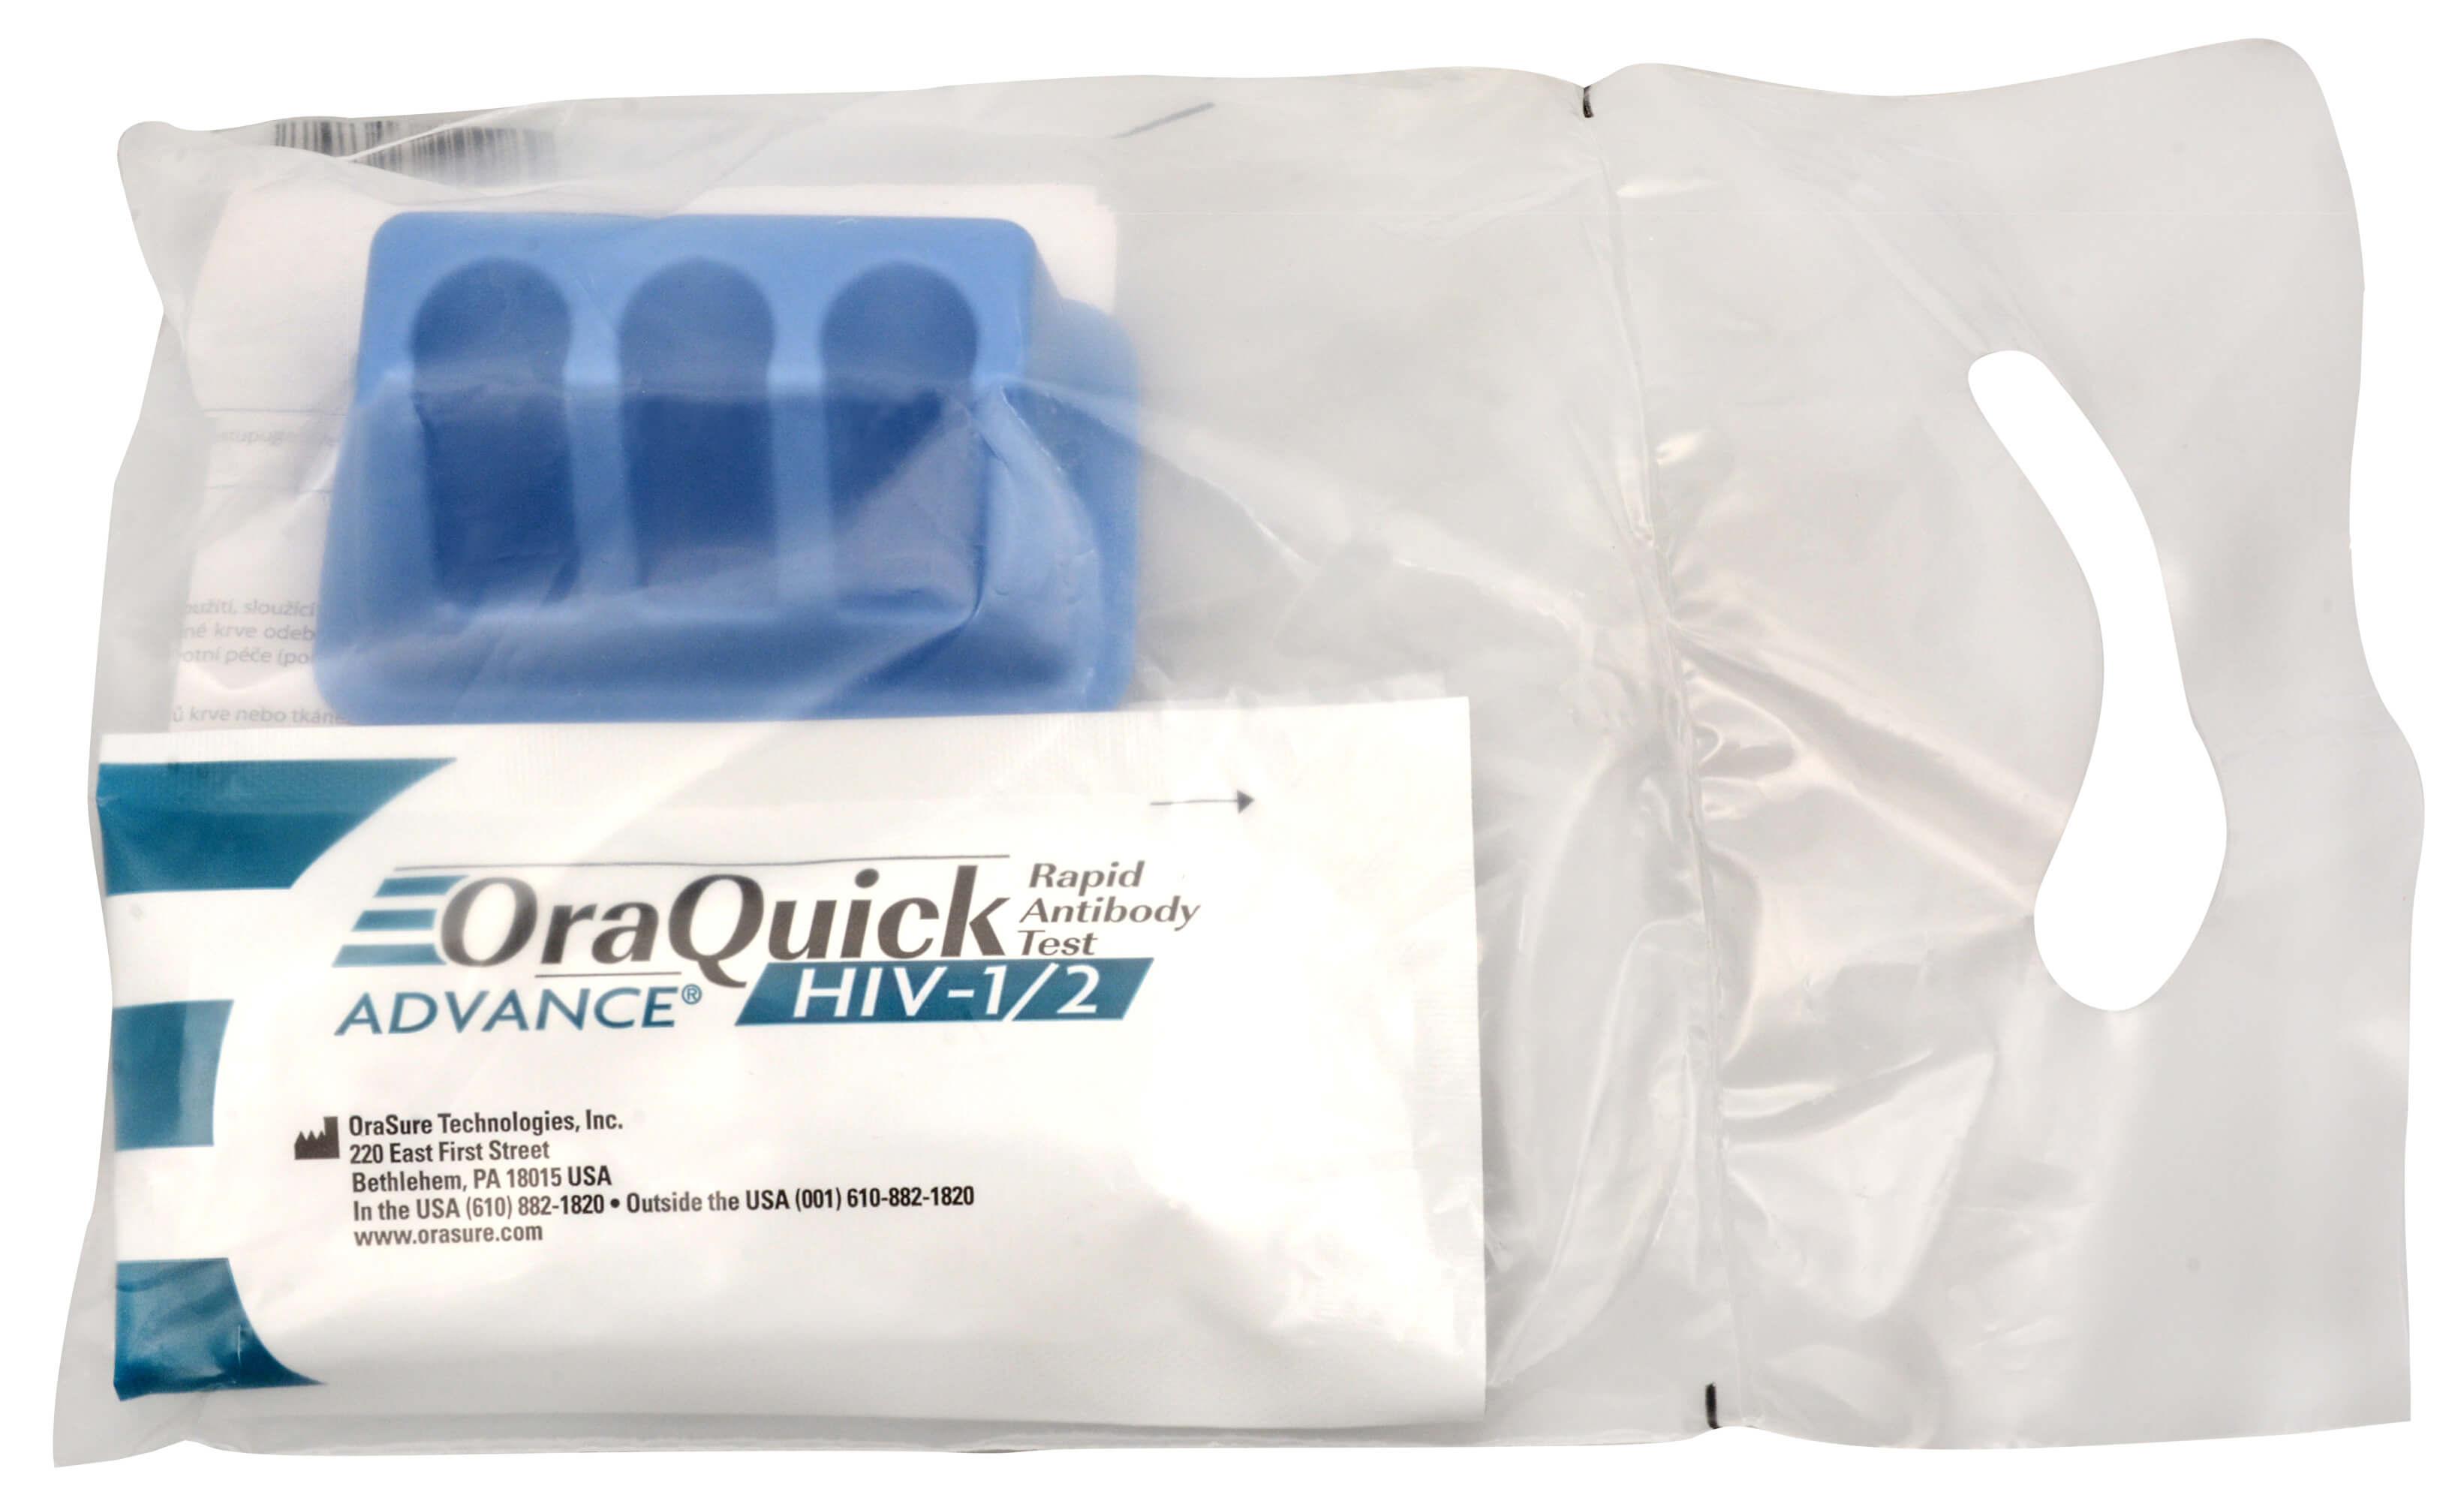 Oraquick Hiv Aids Oraquick Advance Hiv 1 2 Rapid Antib Test Vivantis